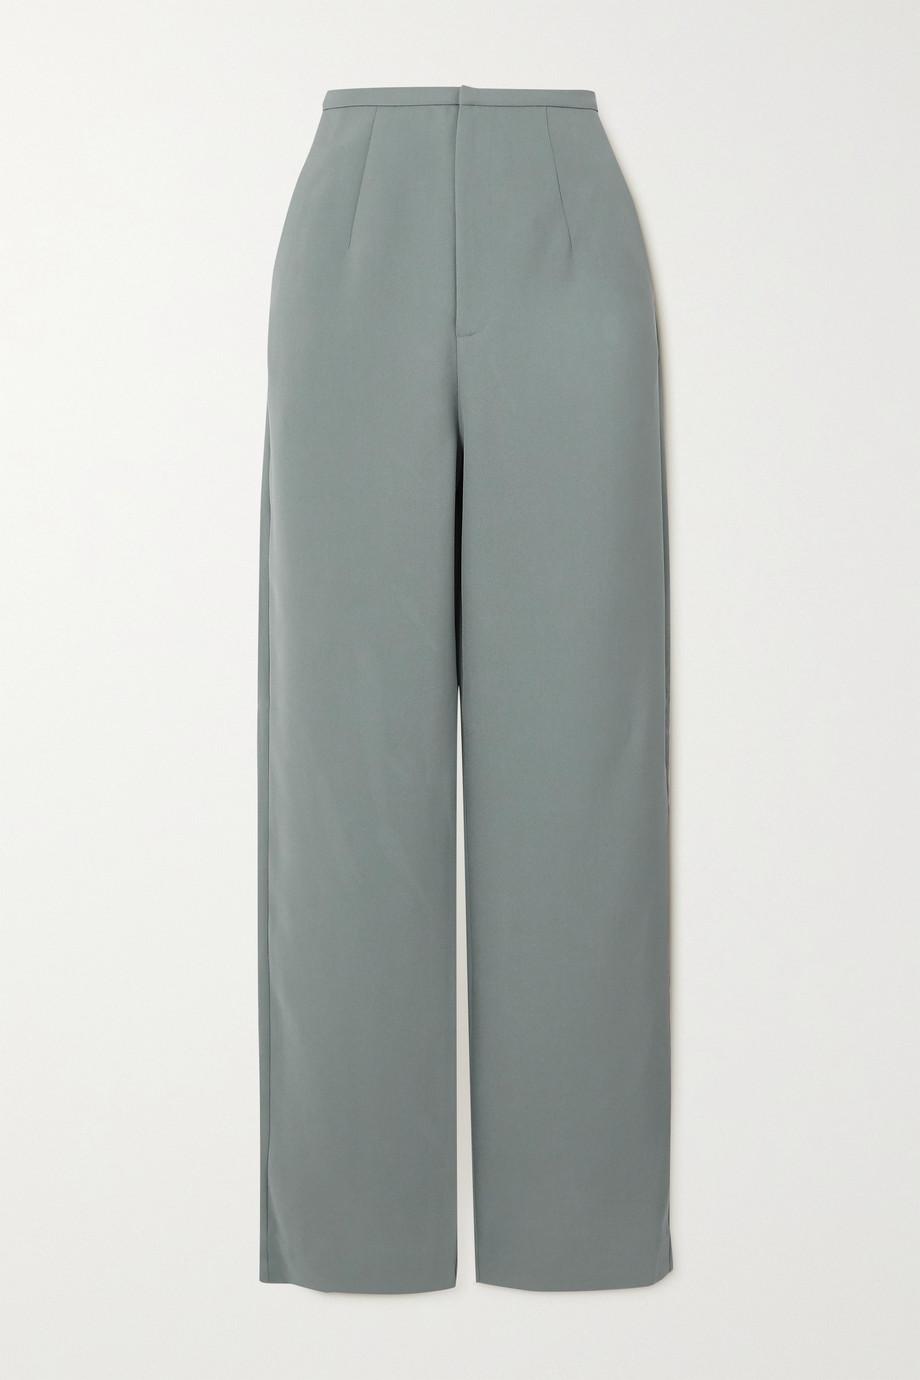 Totême Arles woven straight-leg pants